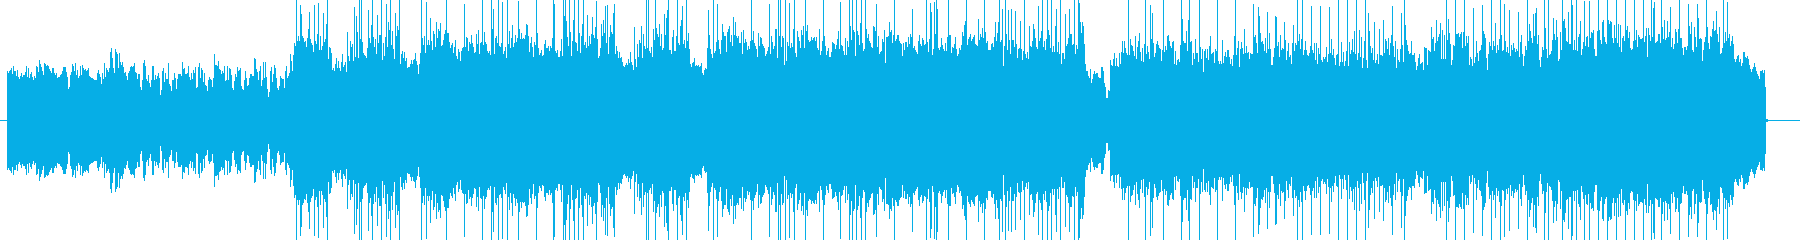 「HR/HM」「DARK」BGM136の再生済みの波形